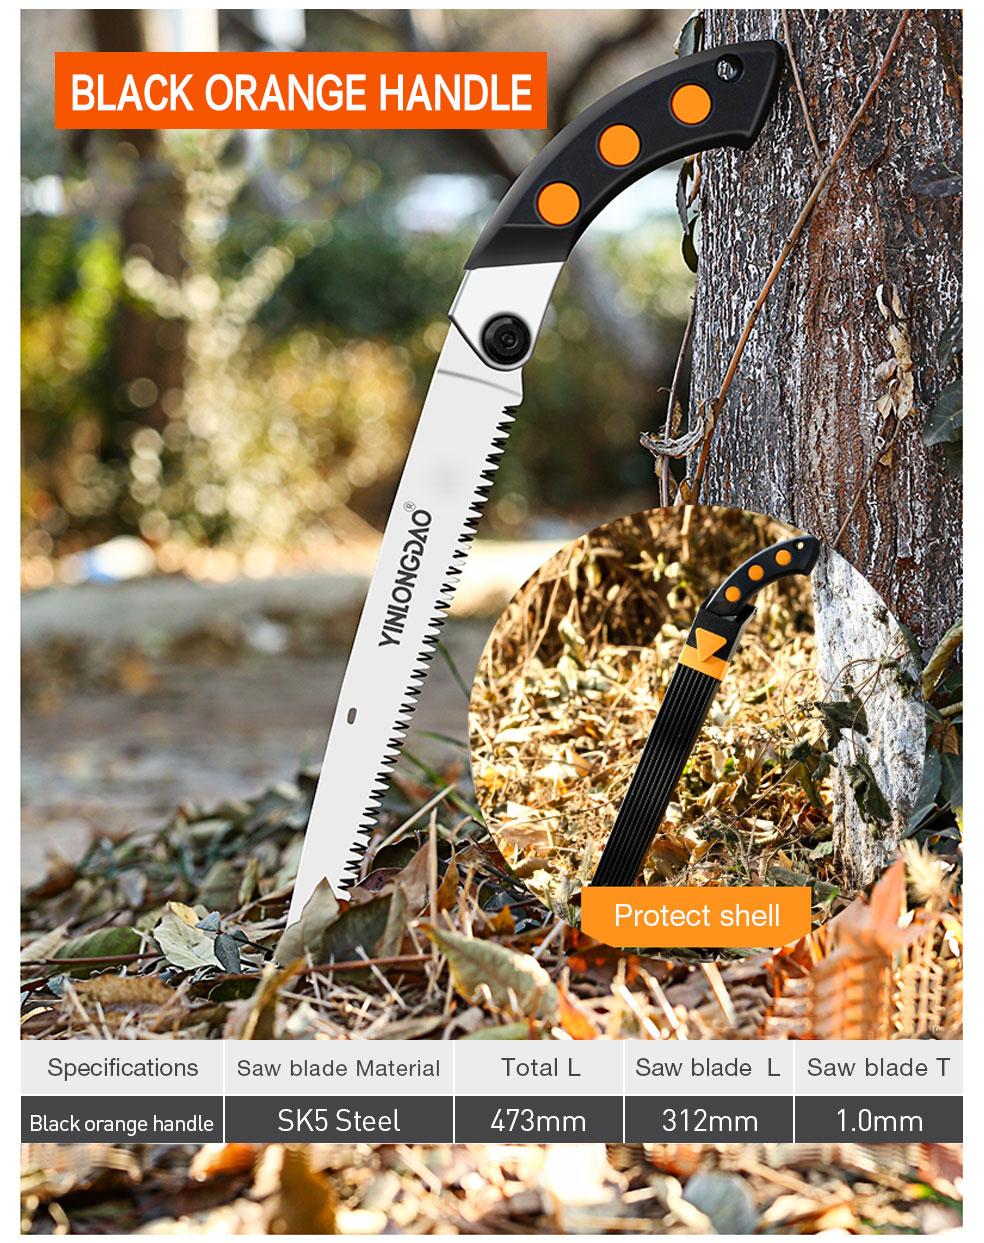 AI-ROAD handsaw black orange handle